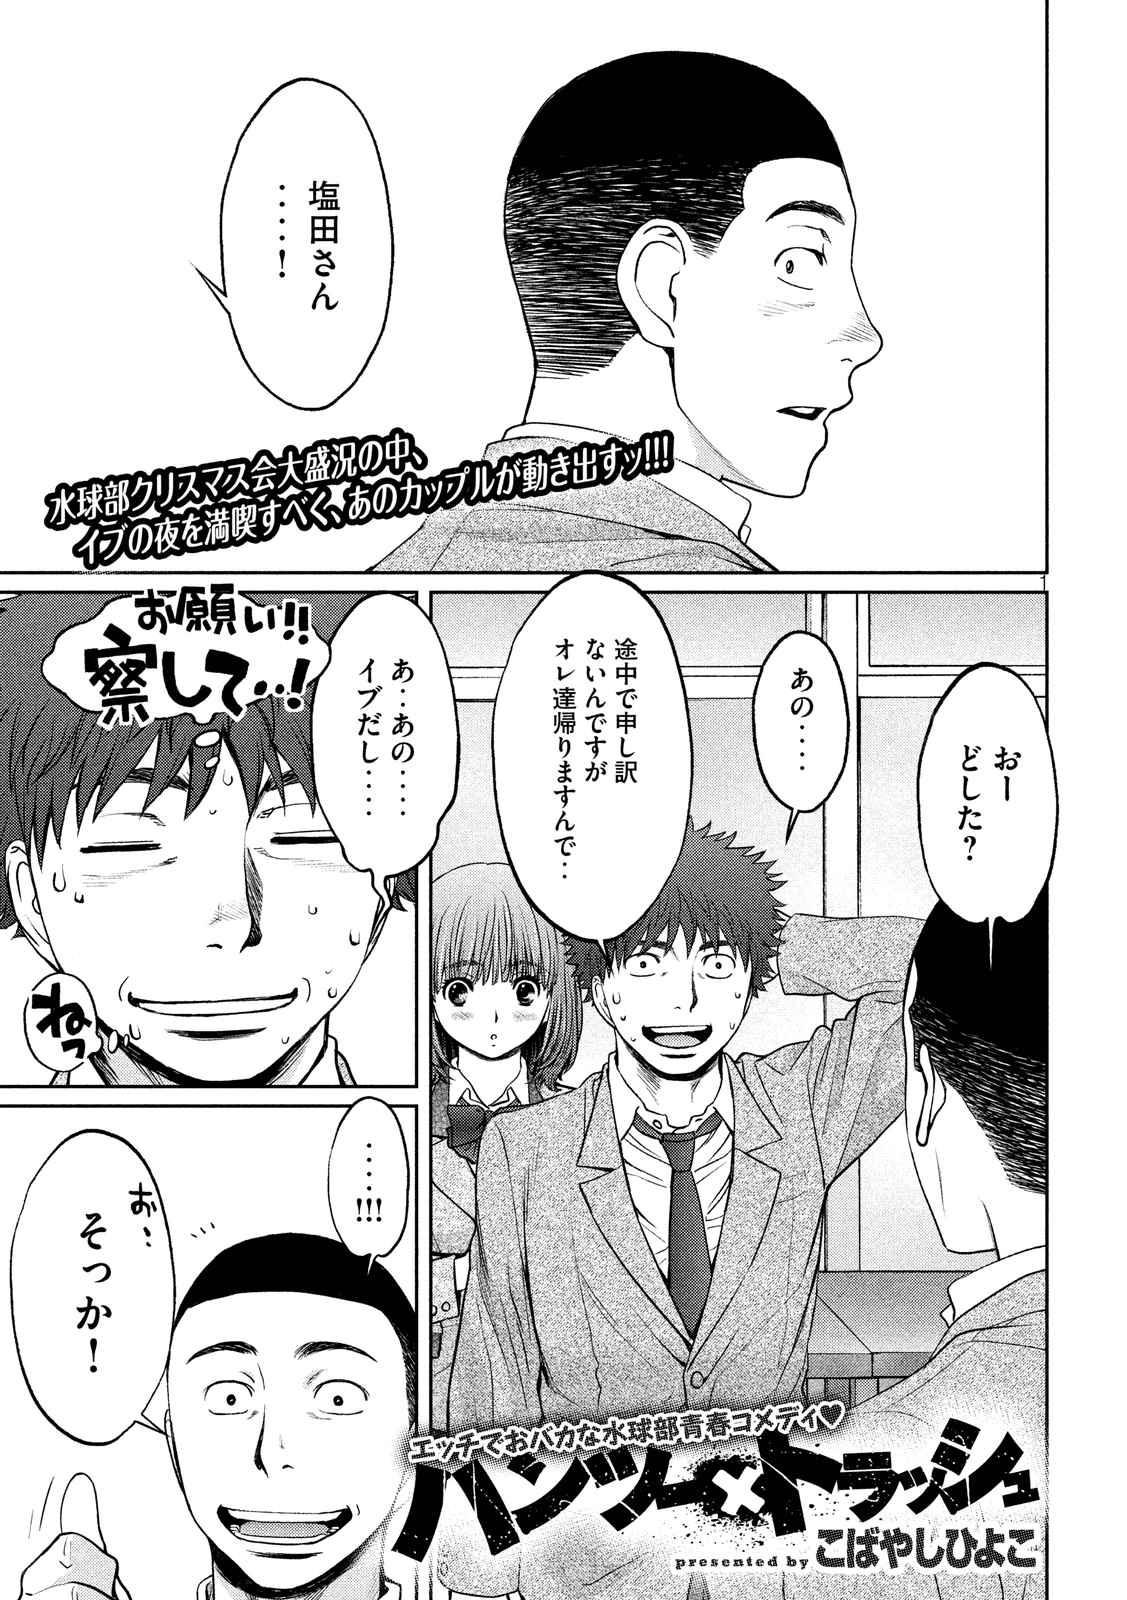 Hantsu x Trash - Chapter 128 - Page 1